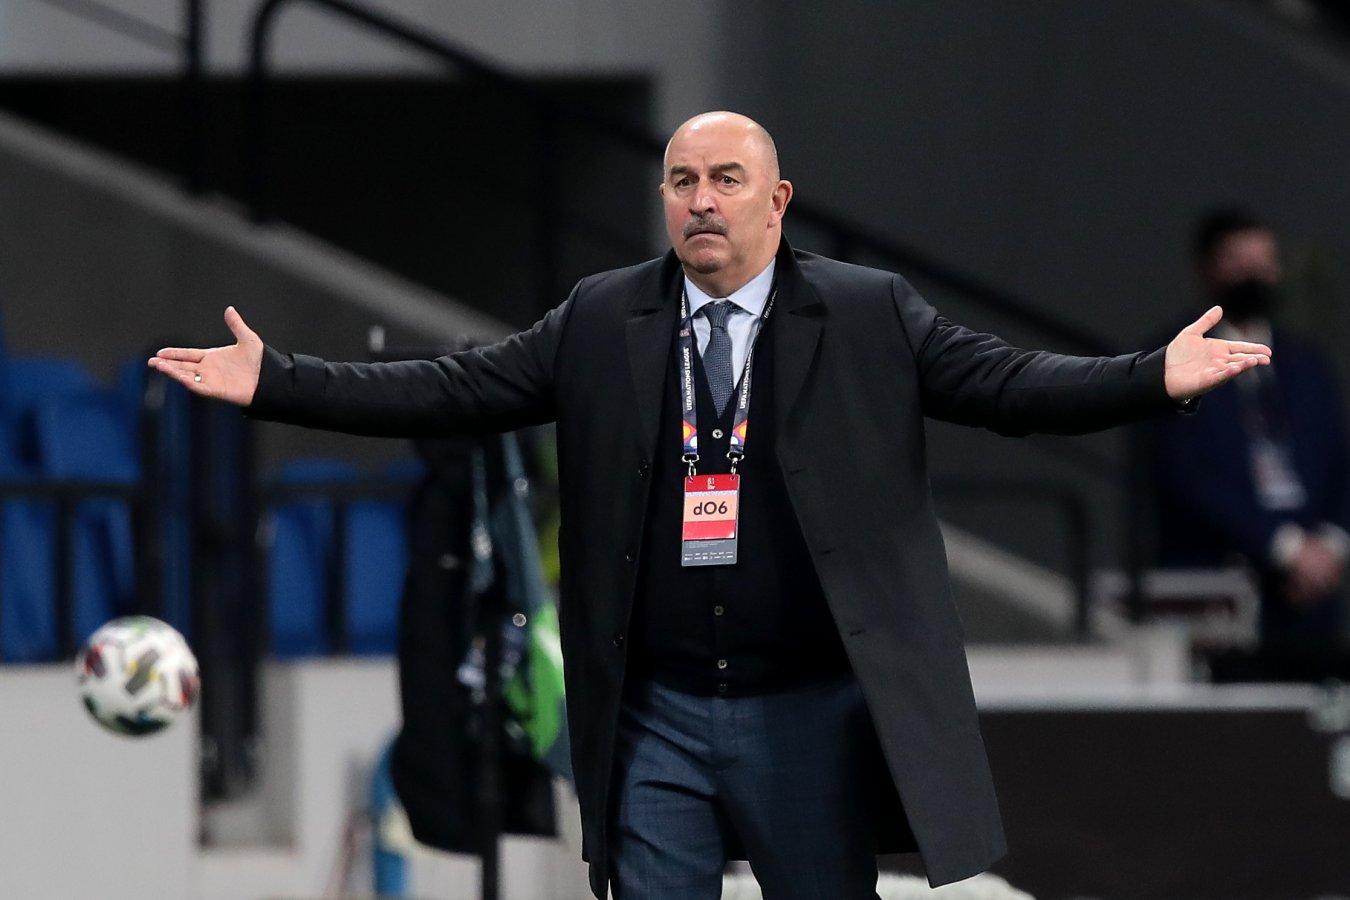 Господи, спаси! Бывший арбитр ФИФА сравнил Станислава Черчесова с Иисусом